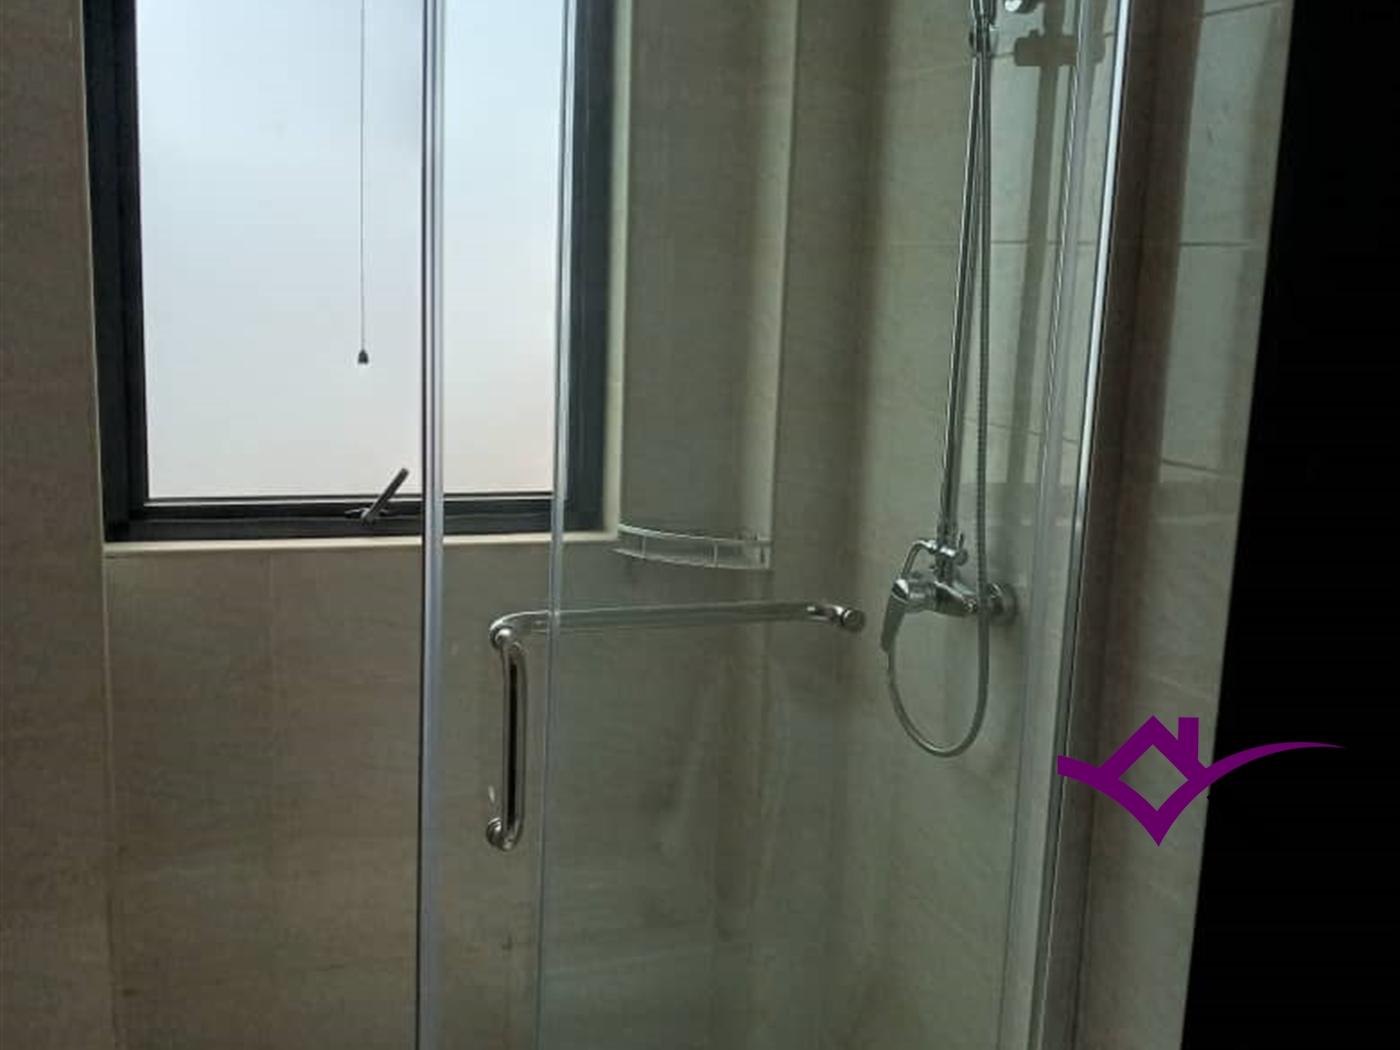 Penthouse for rent in Naguru Kampala